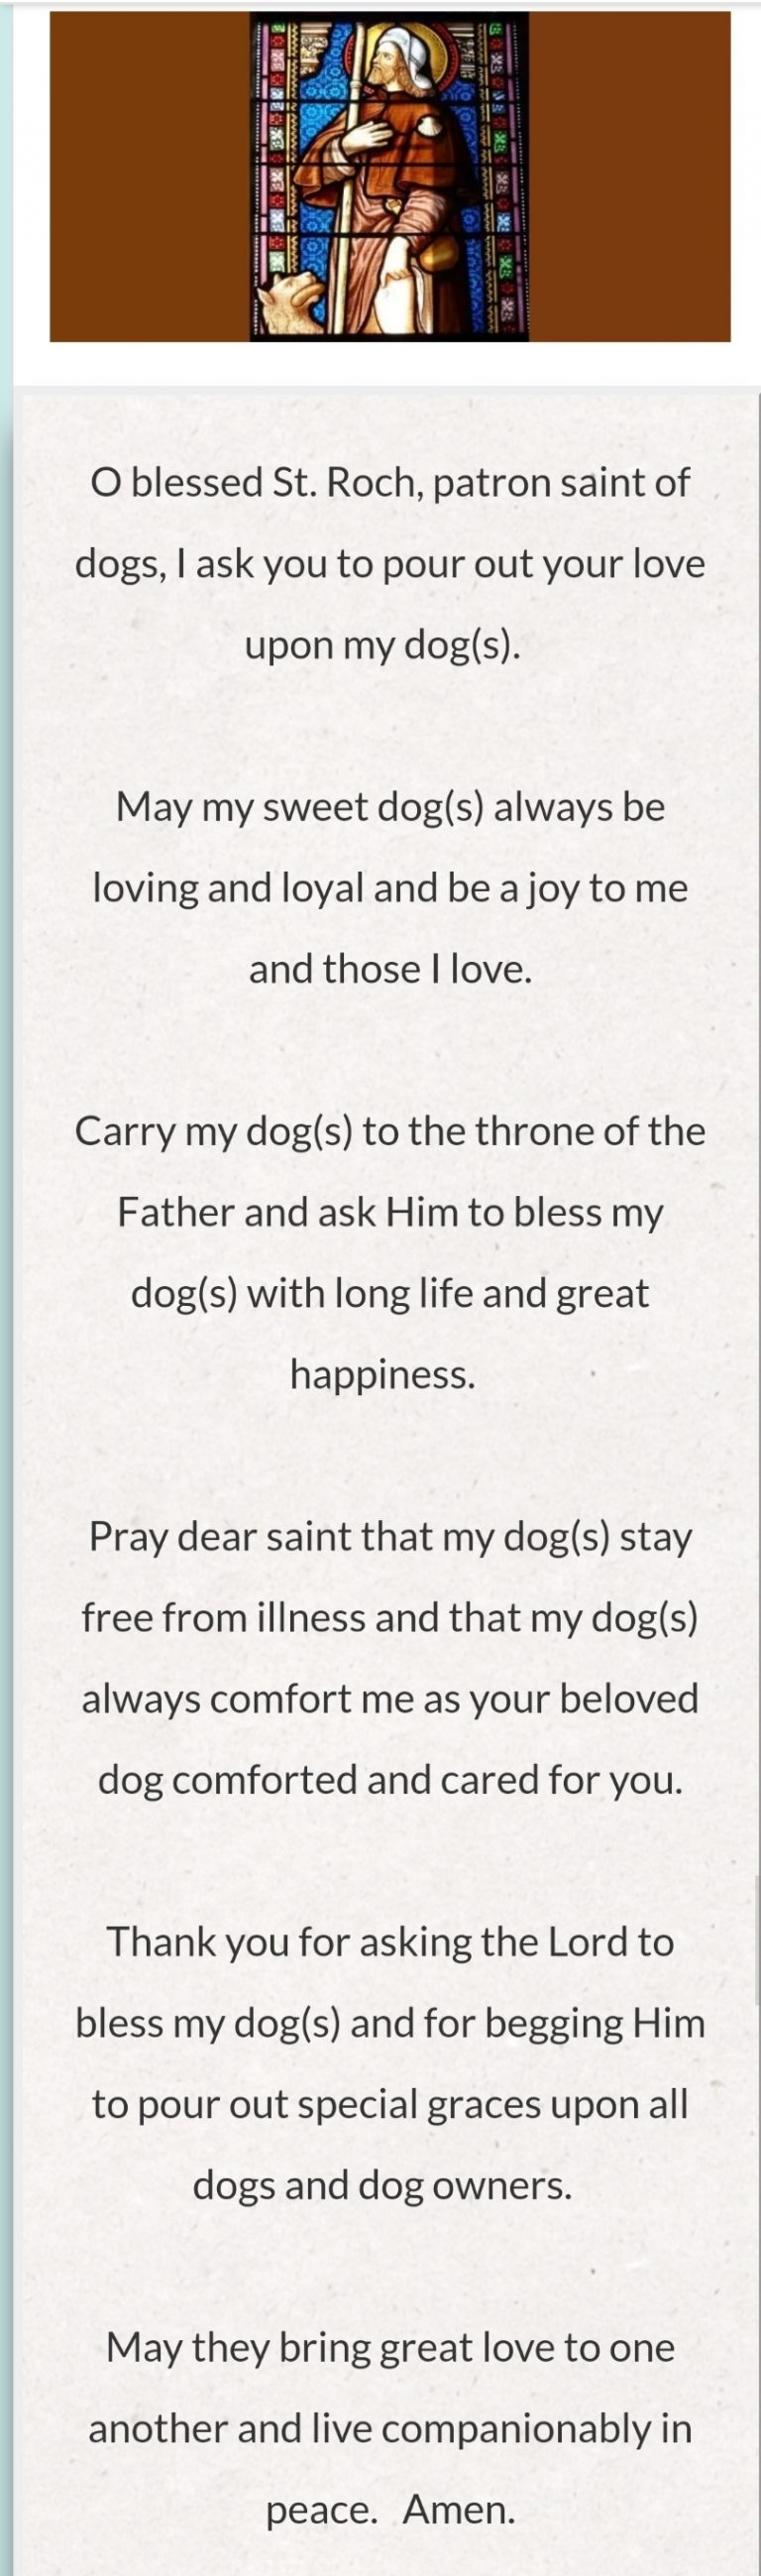 Prayer of Saint Roque